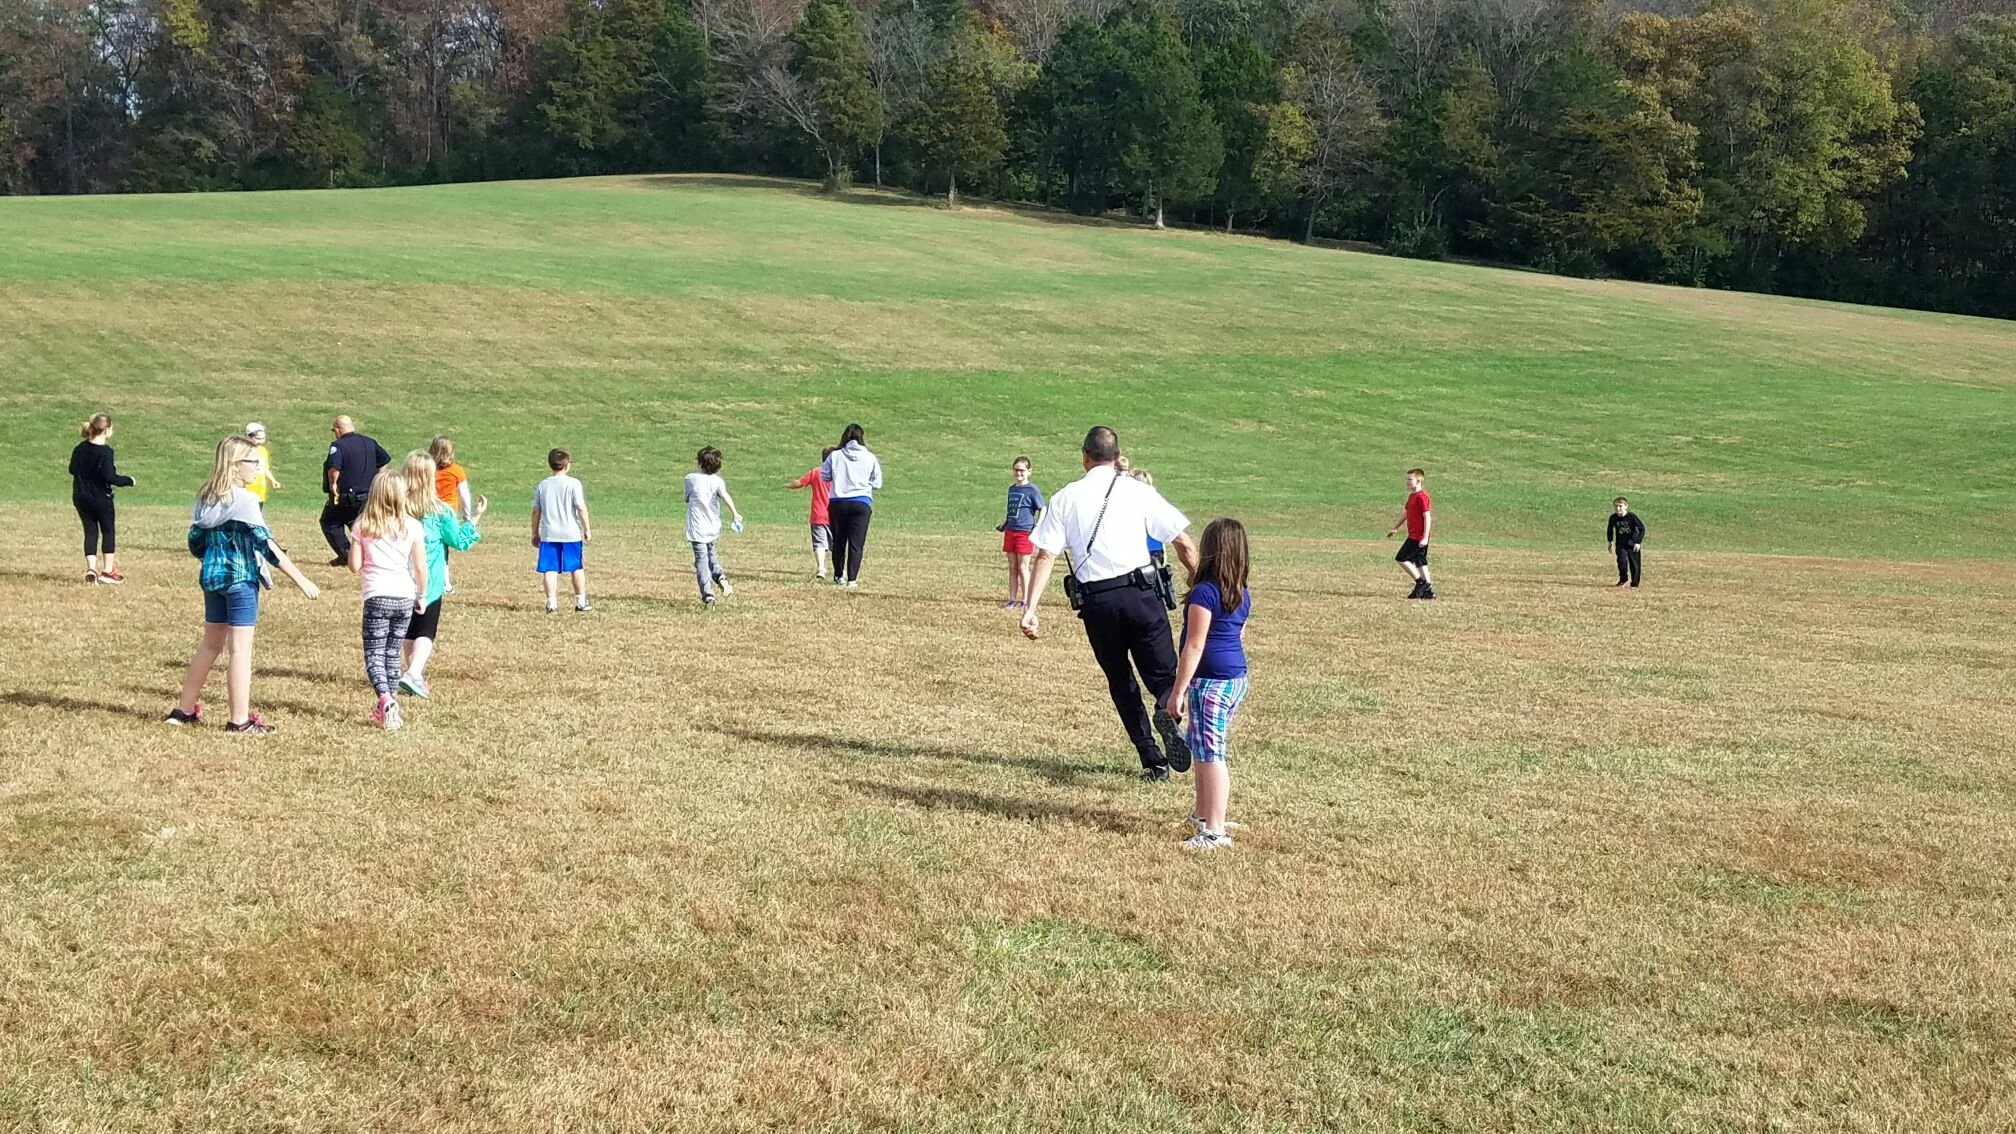 Washington, MO police officers play kickball with 4th grade students at Washington West Elementary School.